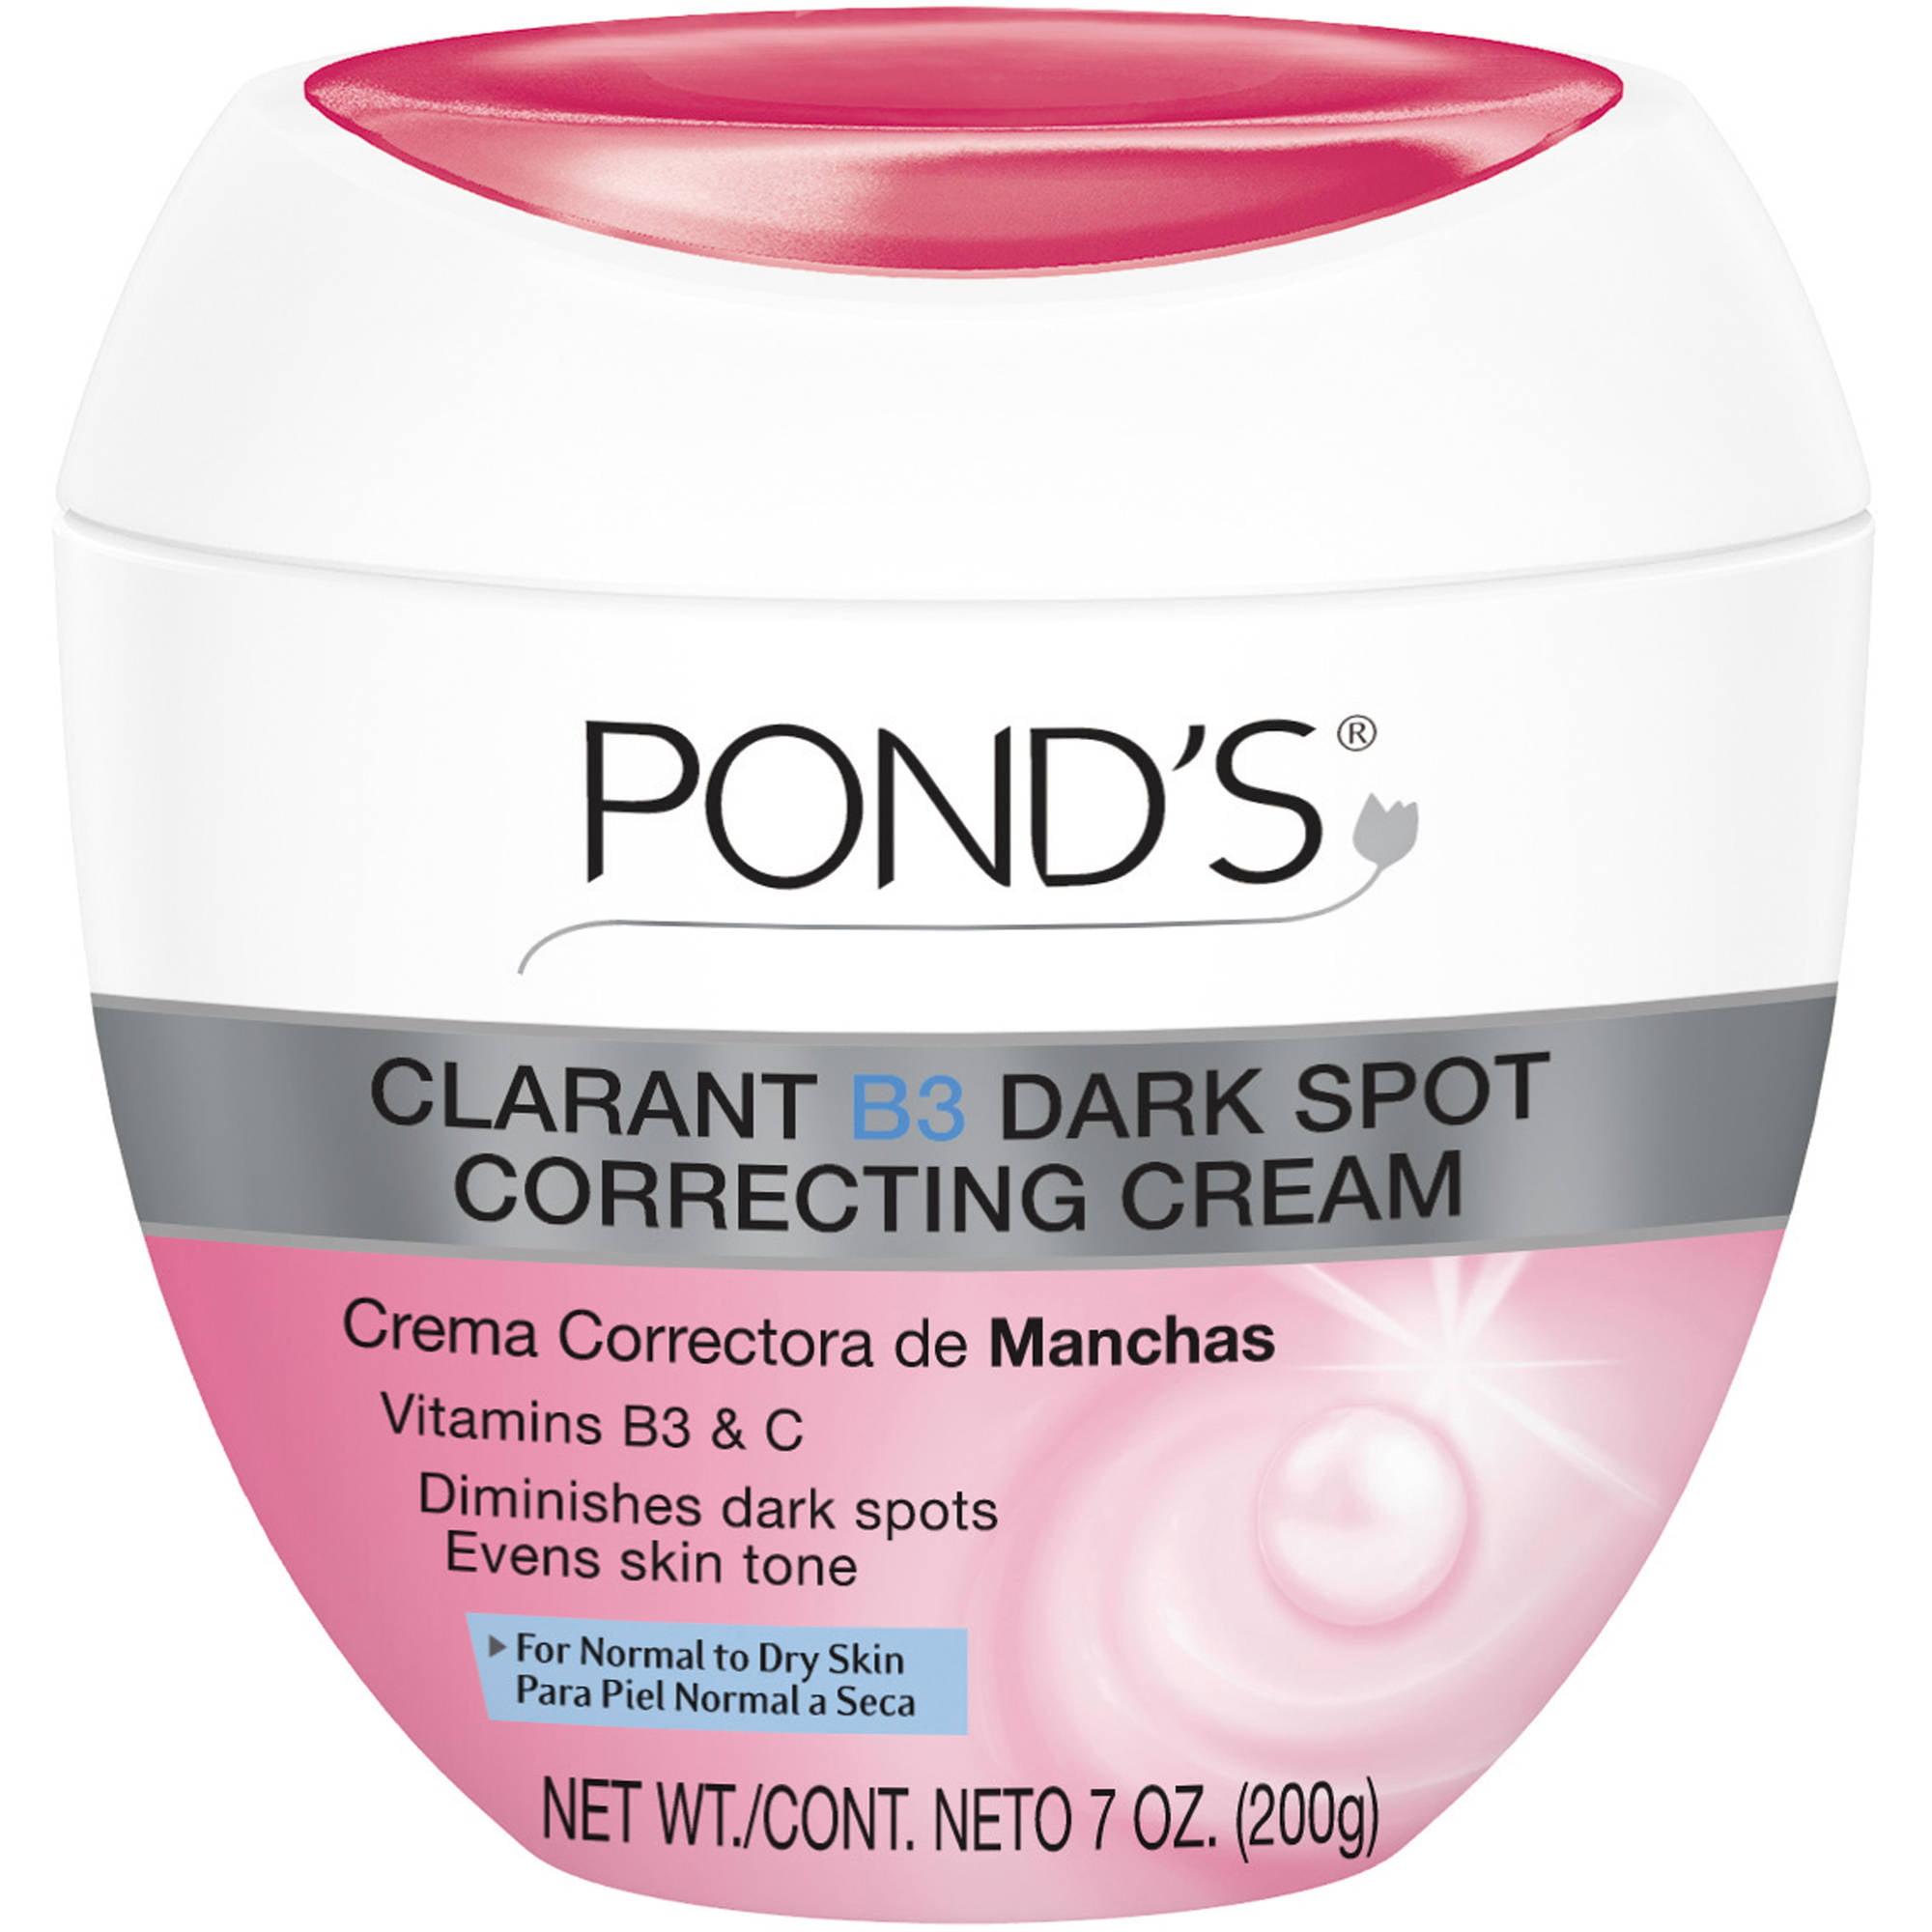 Pond's Clarant B3 Dark Spot Normal to Dry Skin Correcting Cream, 7 fl oz